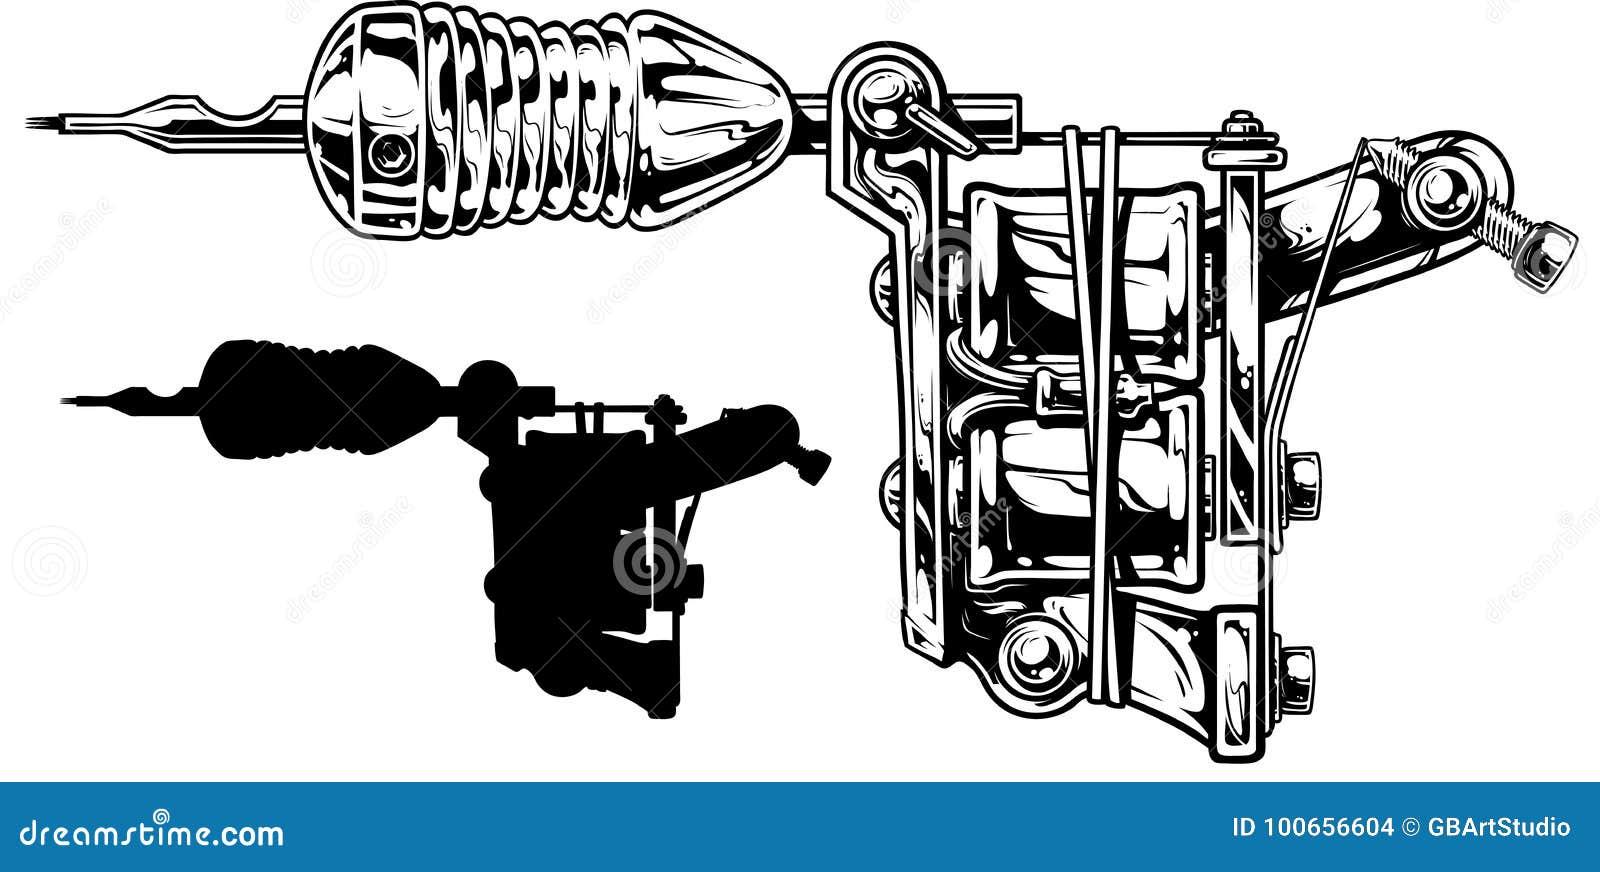 Graphic Black And White Tattoo Machine Set. Vol. 3 Stock Vector ...